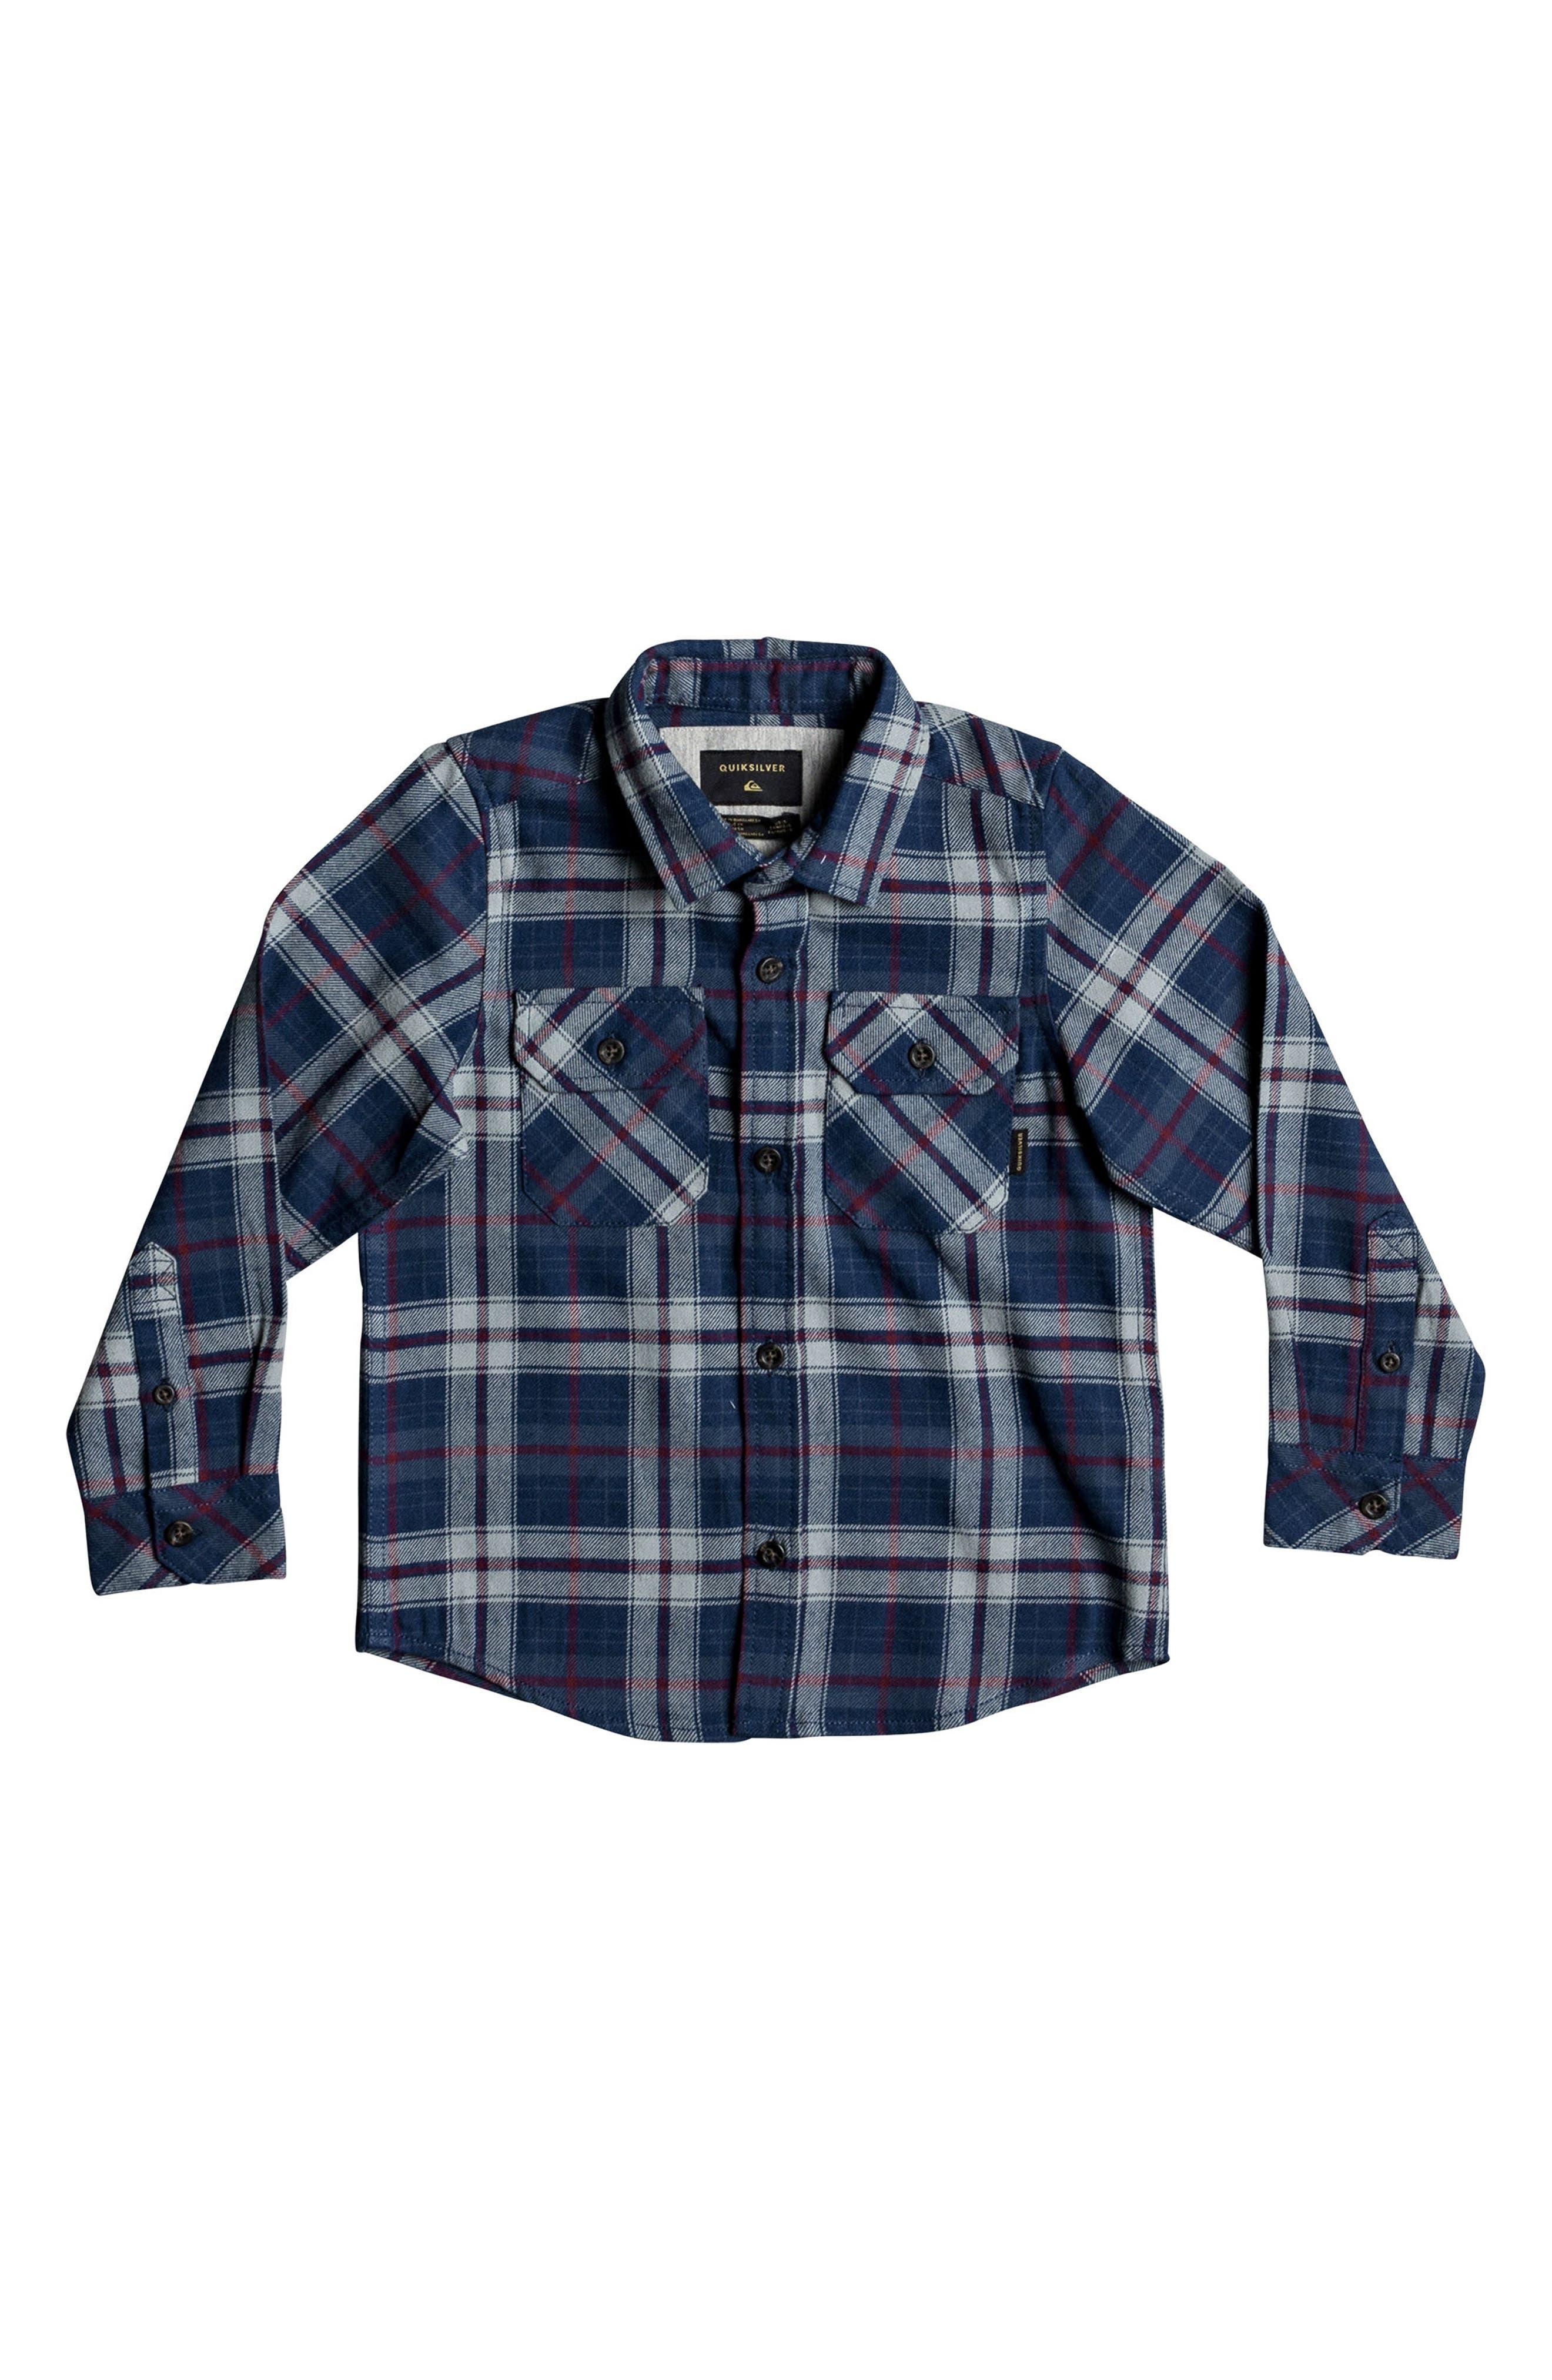 Main Image - Quiksilver Fitzspeere Plaid Flannel Shirt (Toddler Boys & Little Boys)